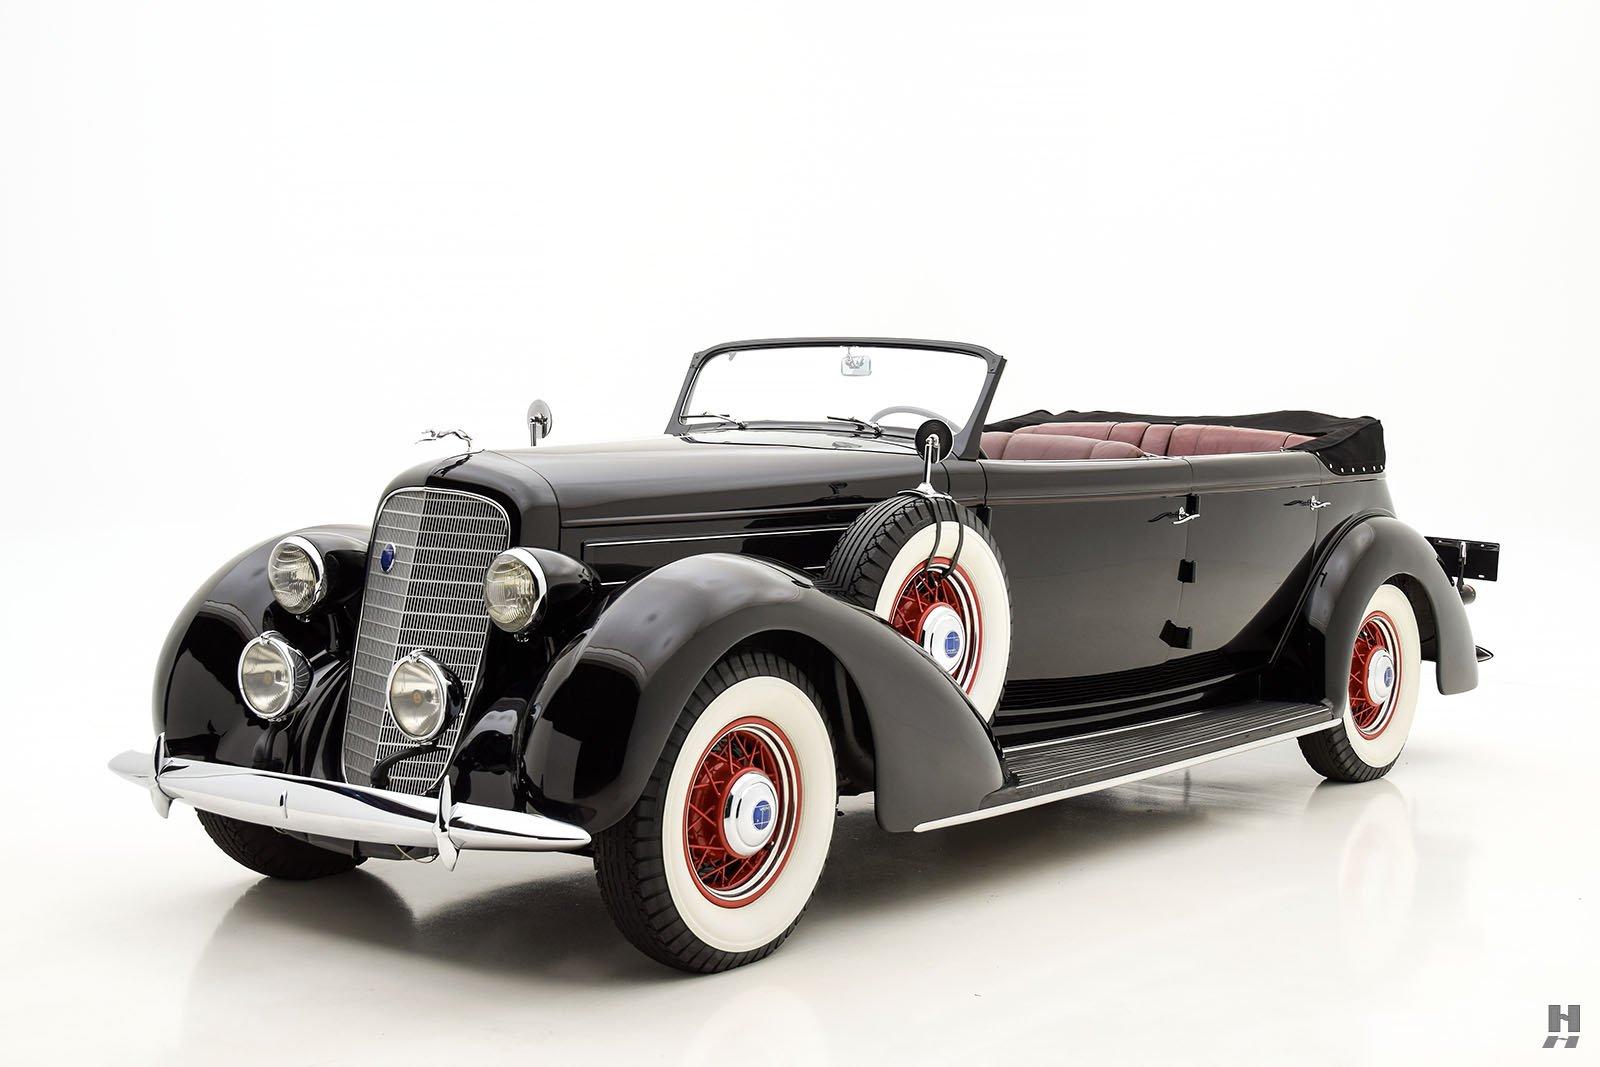 1936 Lincoln Model K Convertible Sedan For Sale   Buy Cars   Hyman LTD